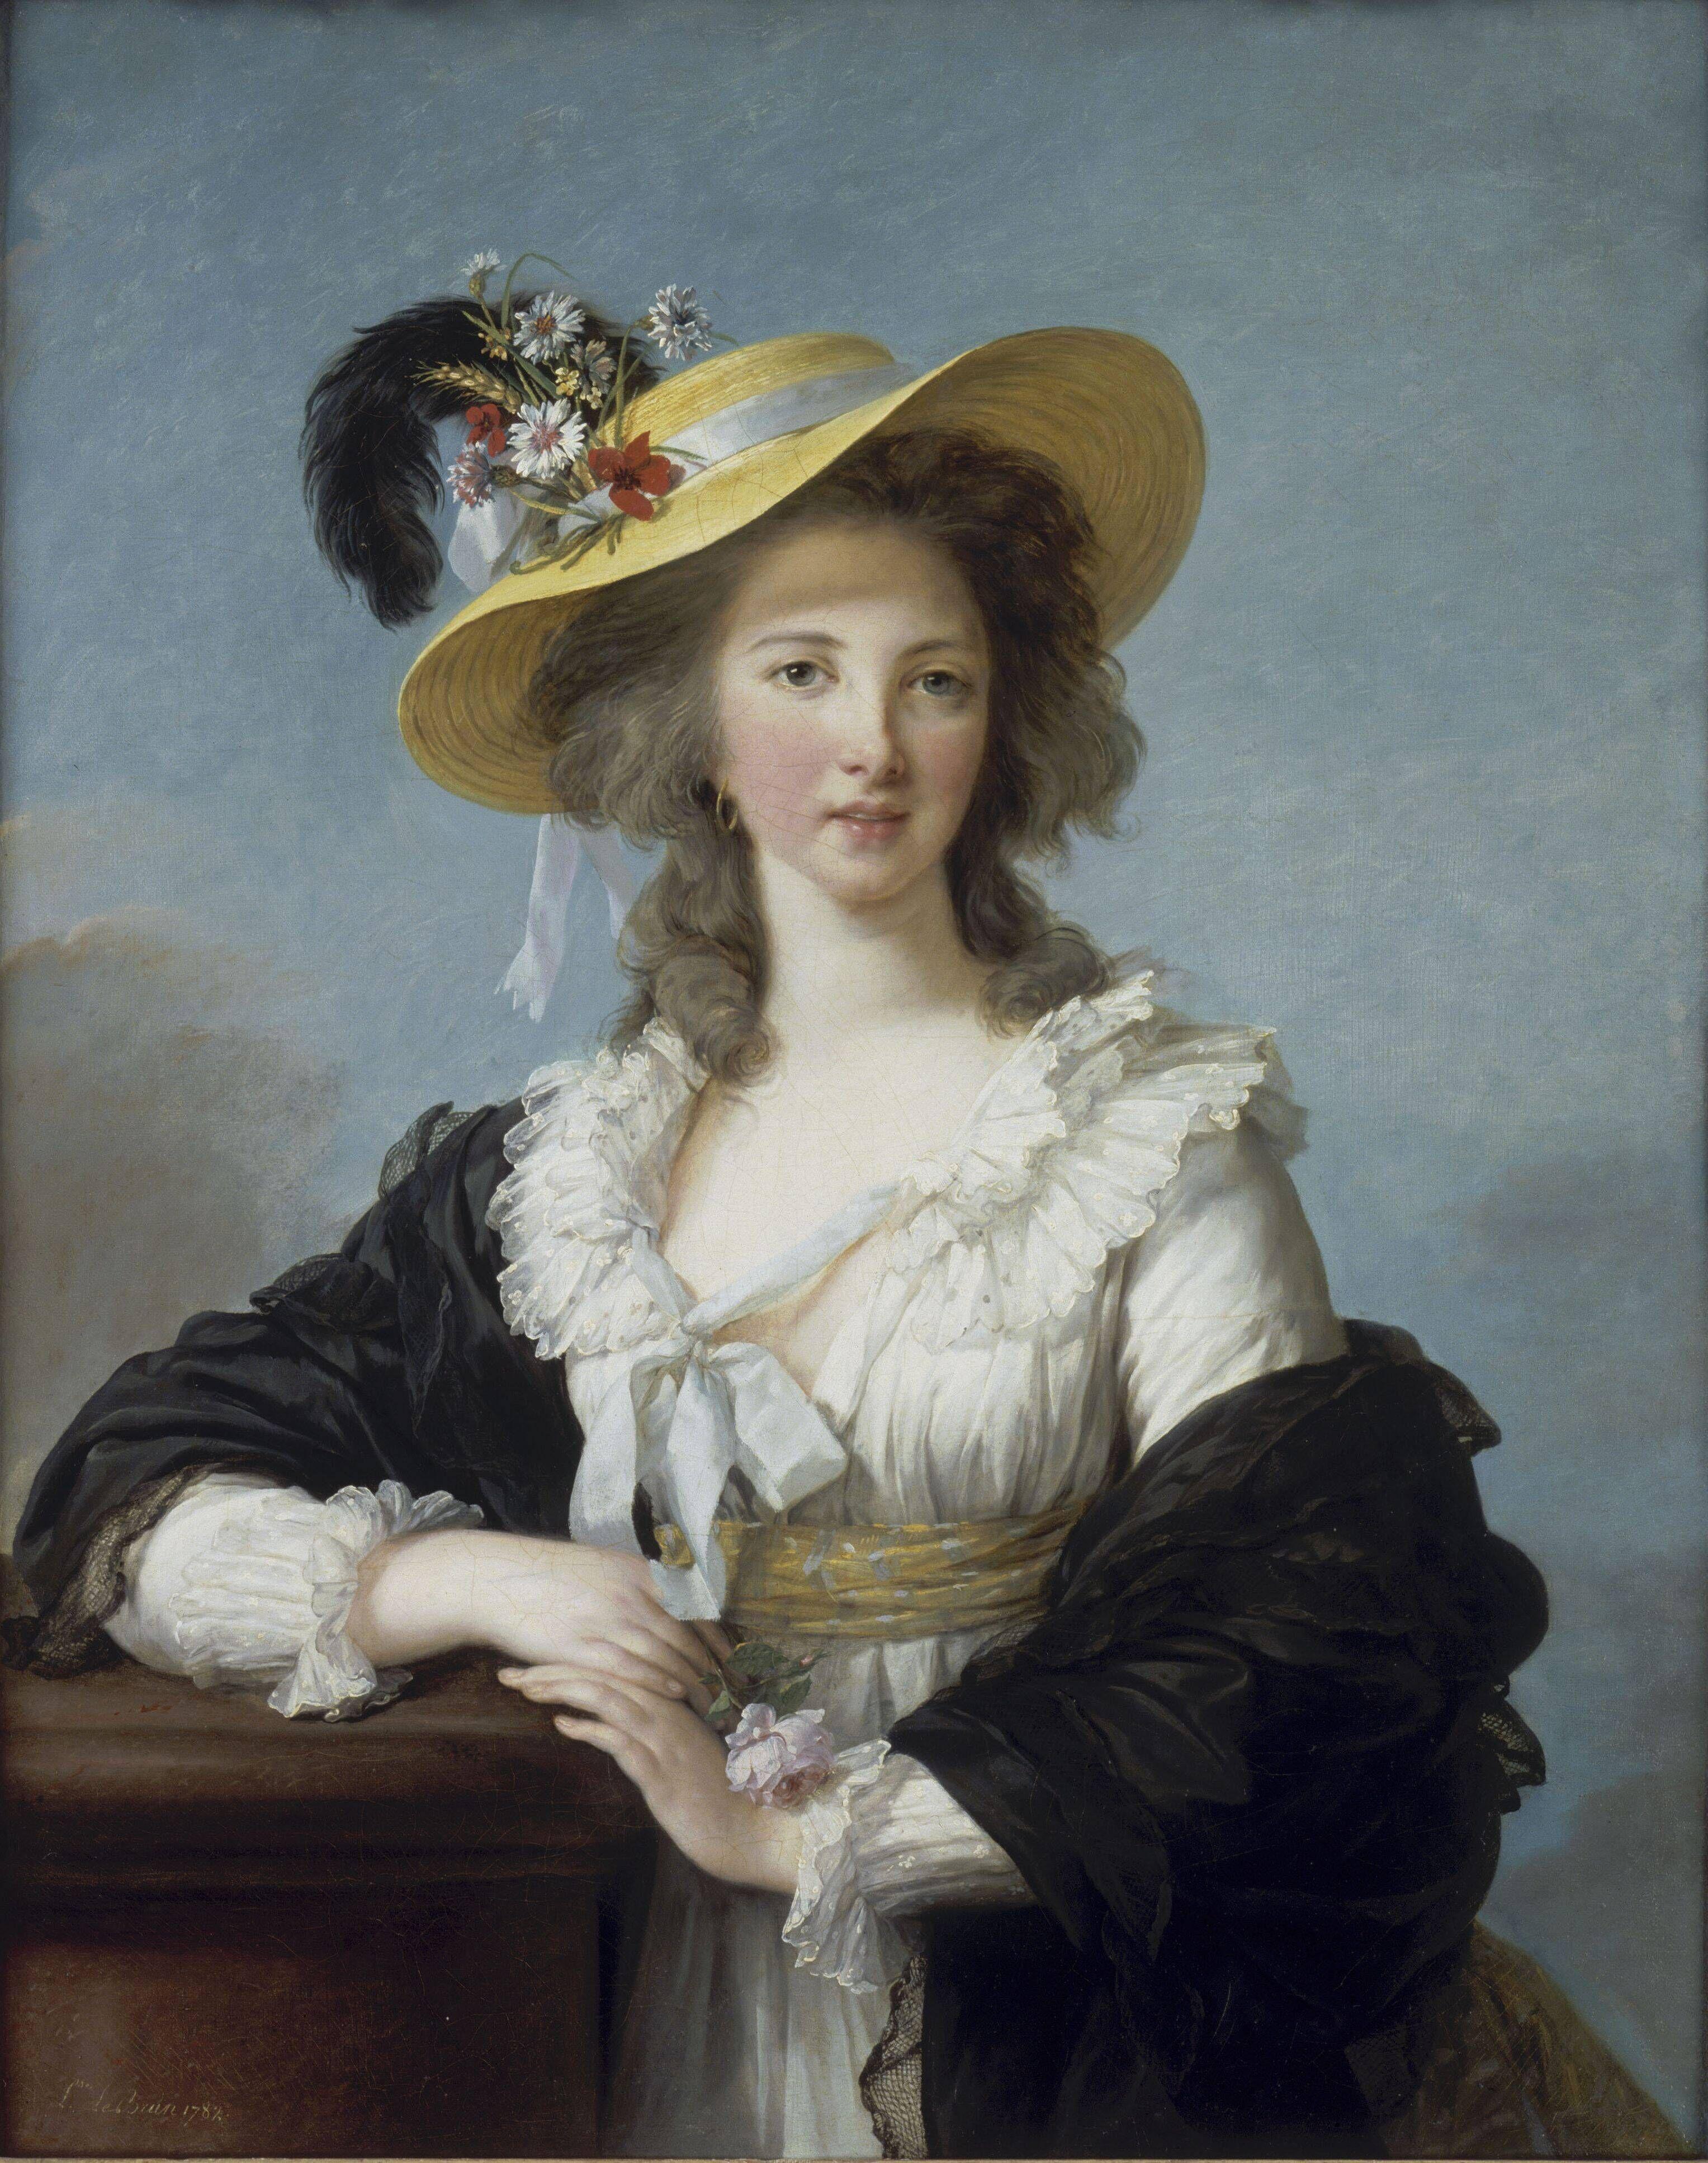 Louis XVI and extra-marrital affairs. Duchess_de_Polignac